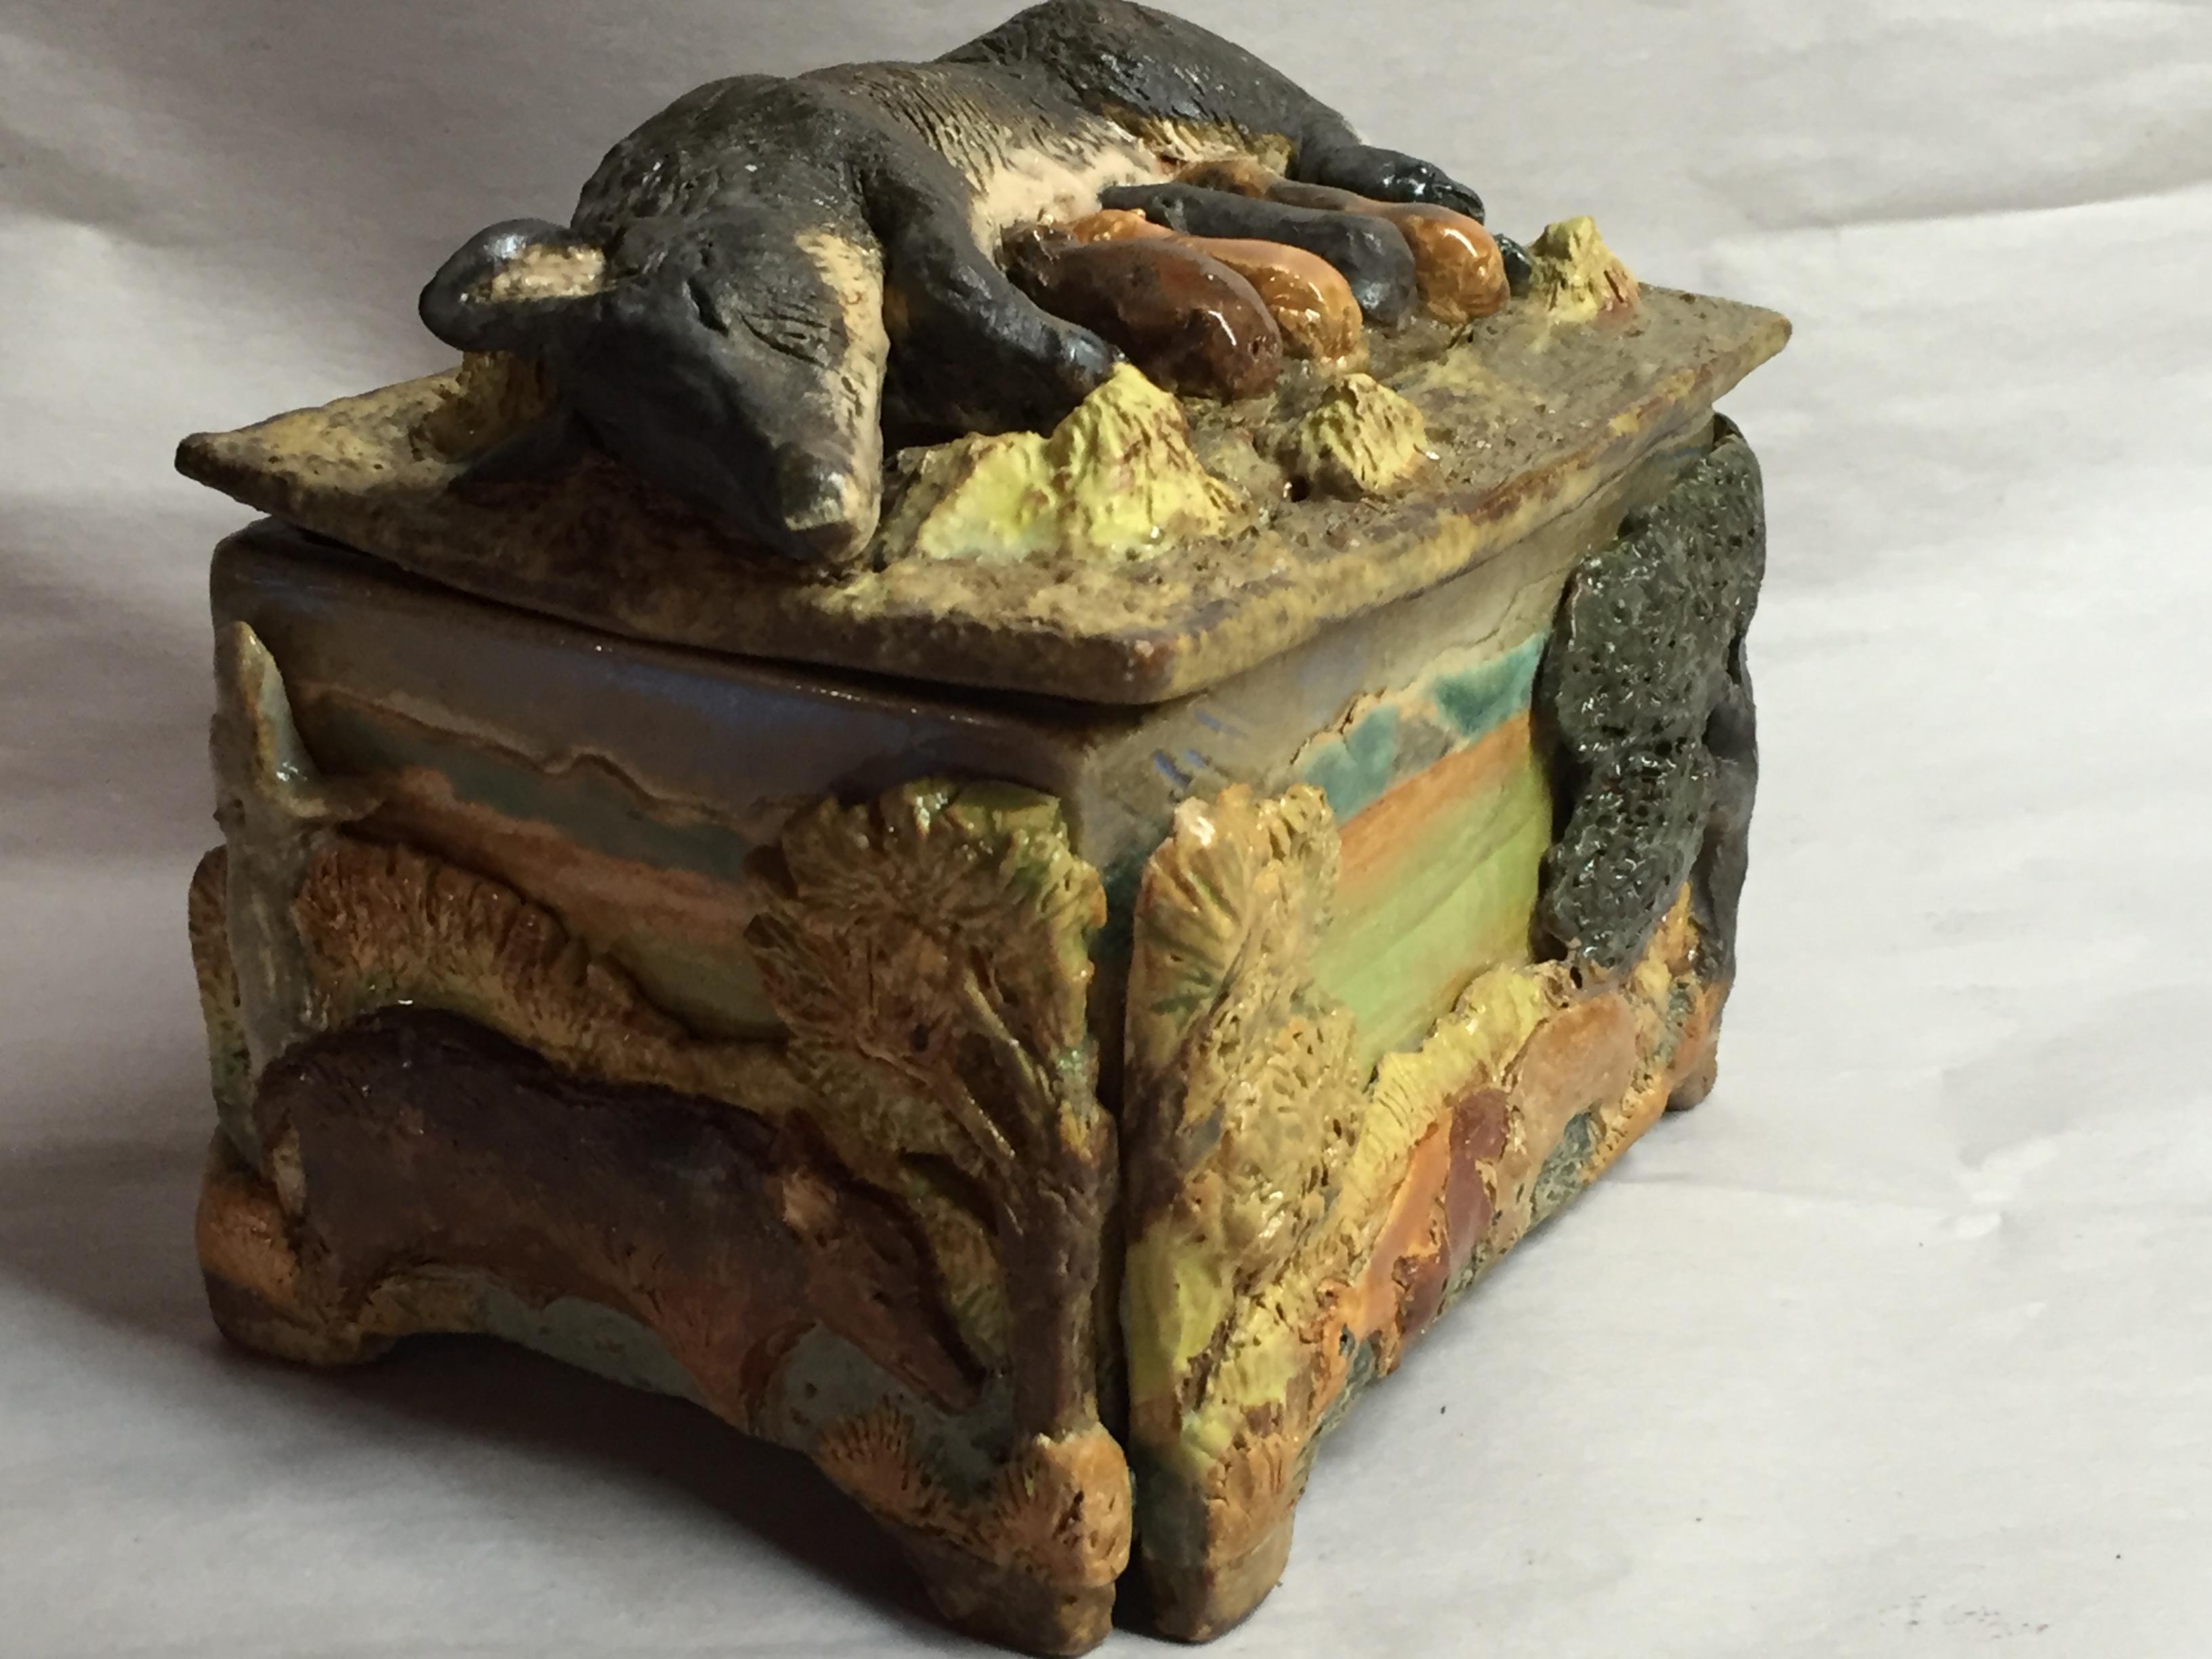 Lidded Hog Box (detail)